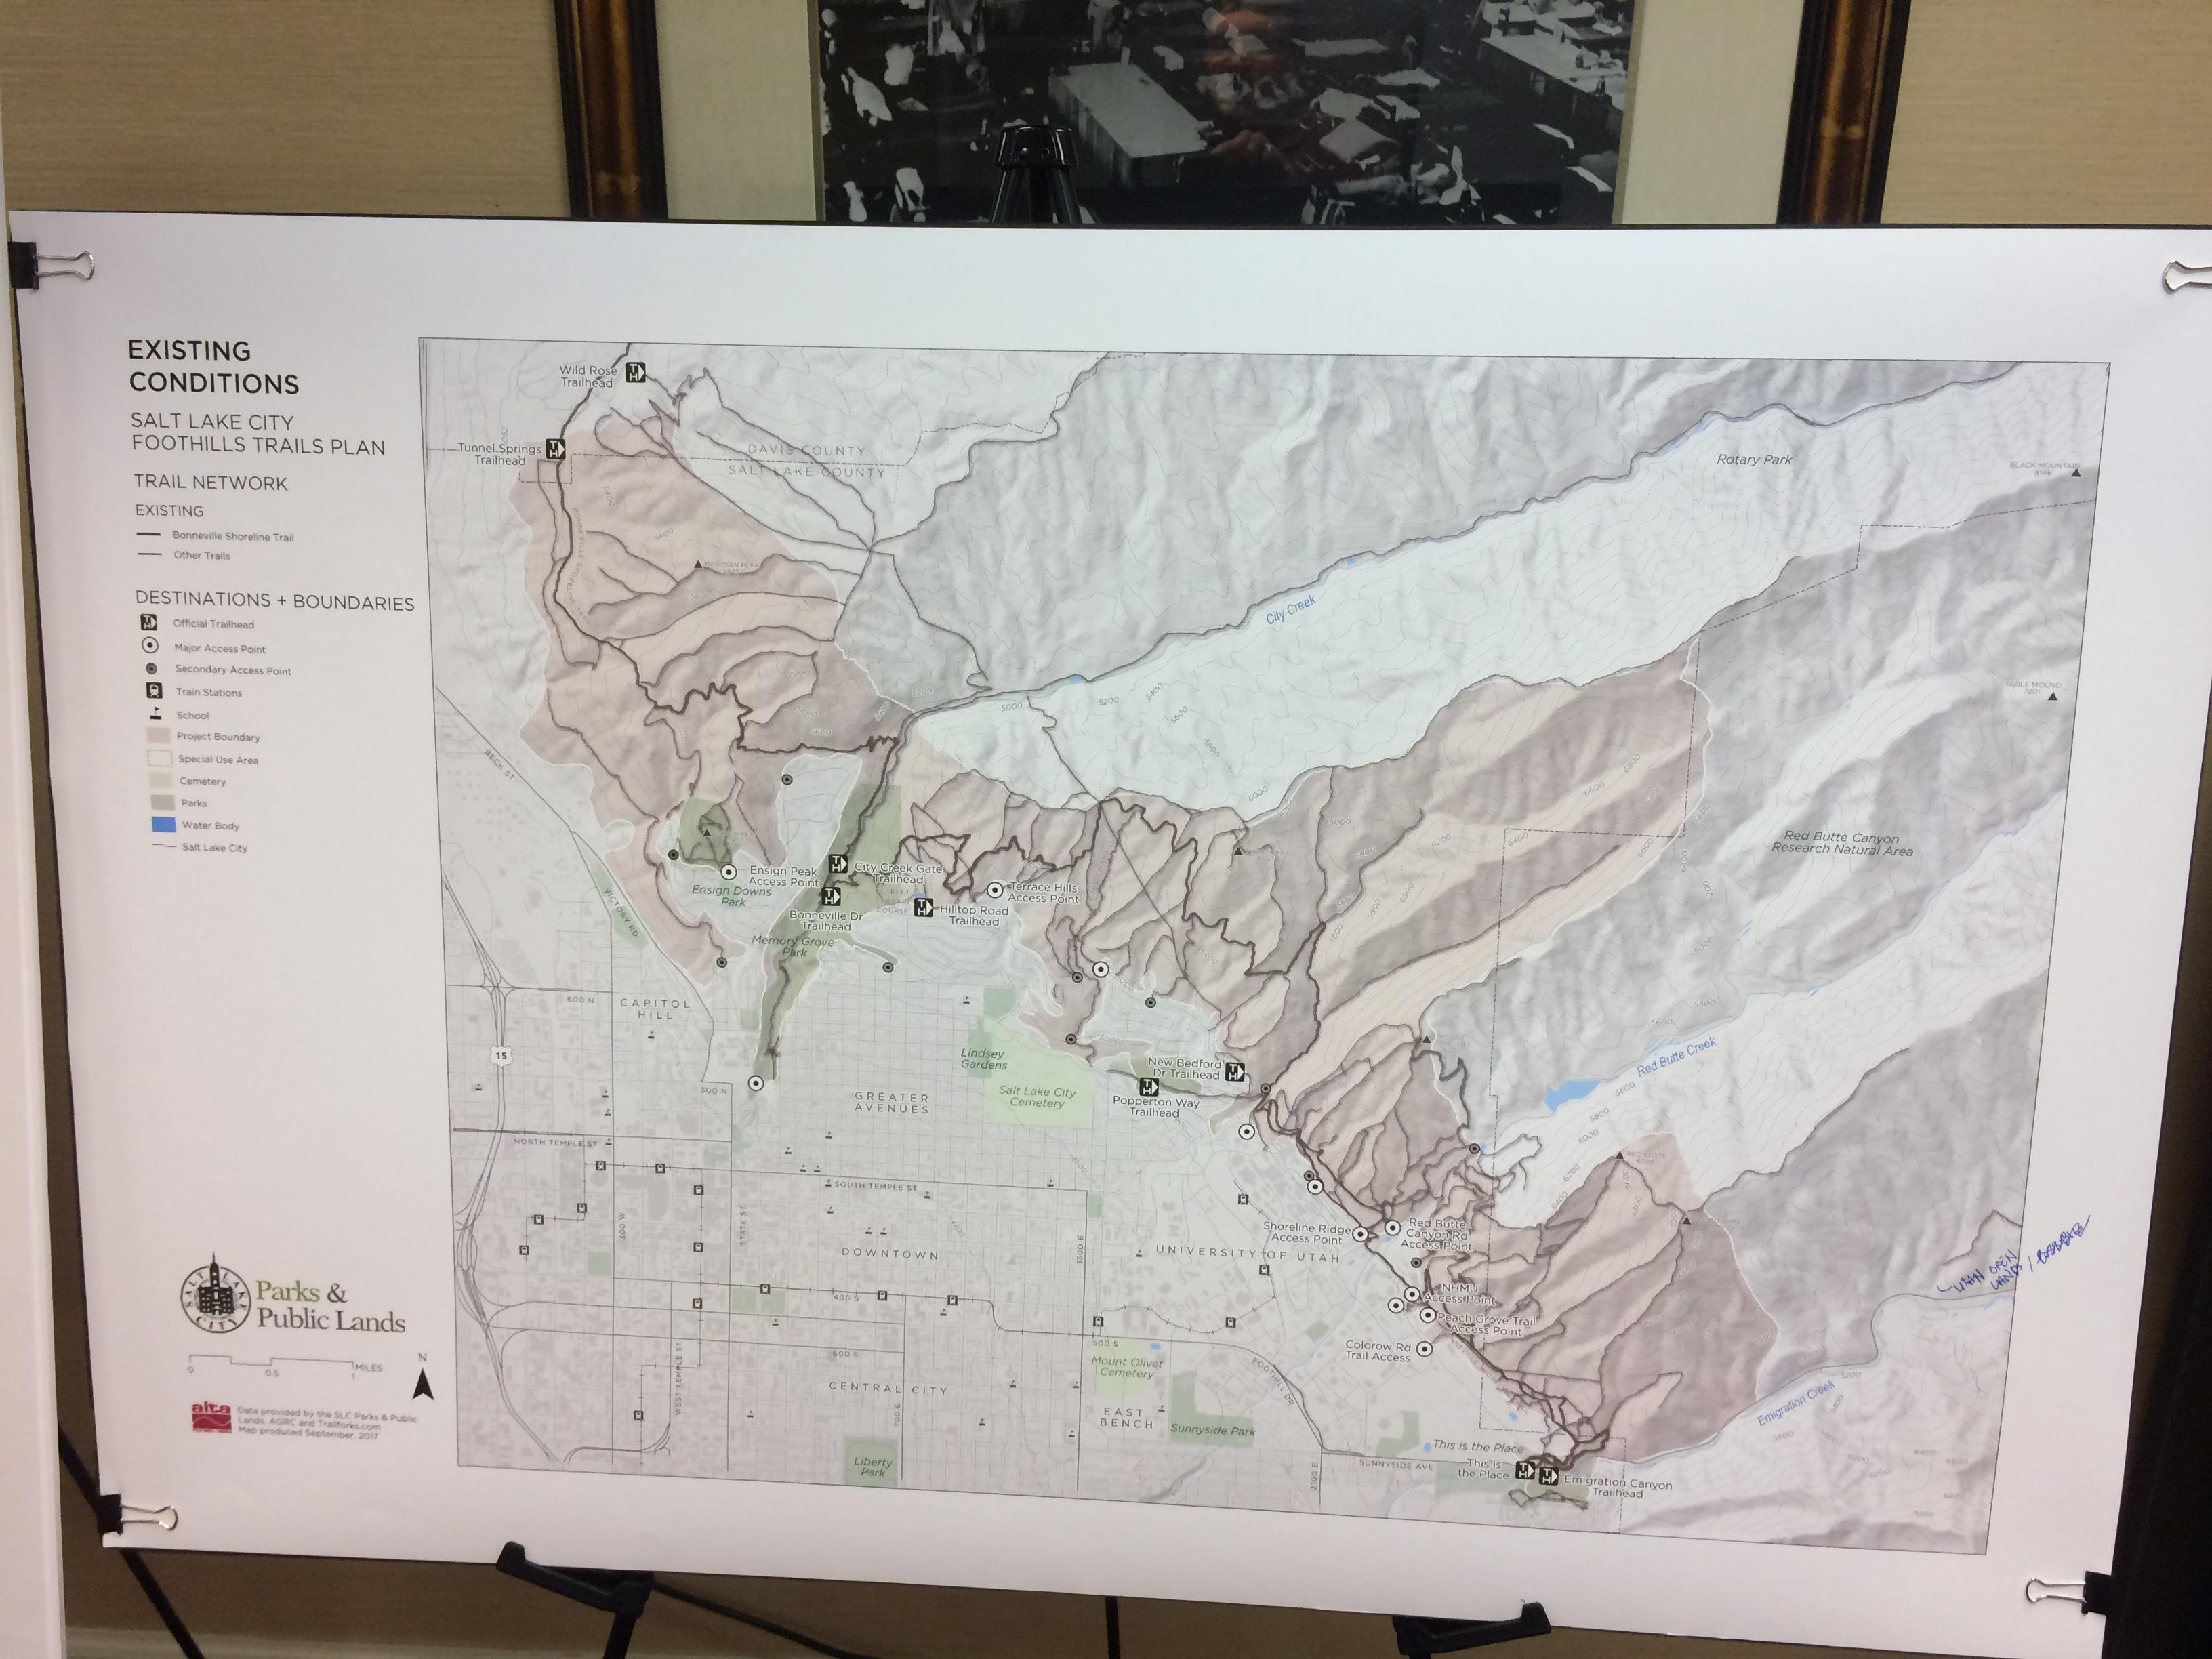 Salt Lake City Mountain Bike Trails PlanIMG_8289